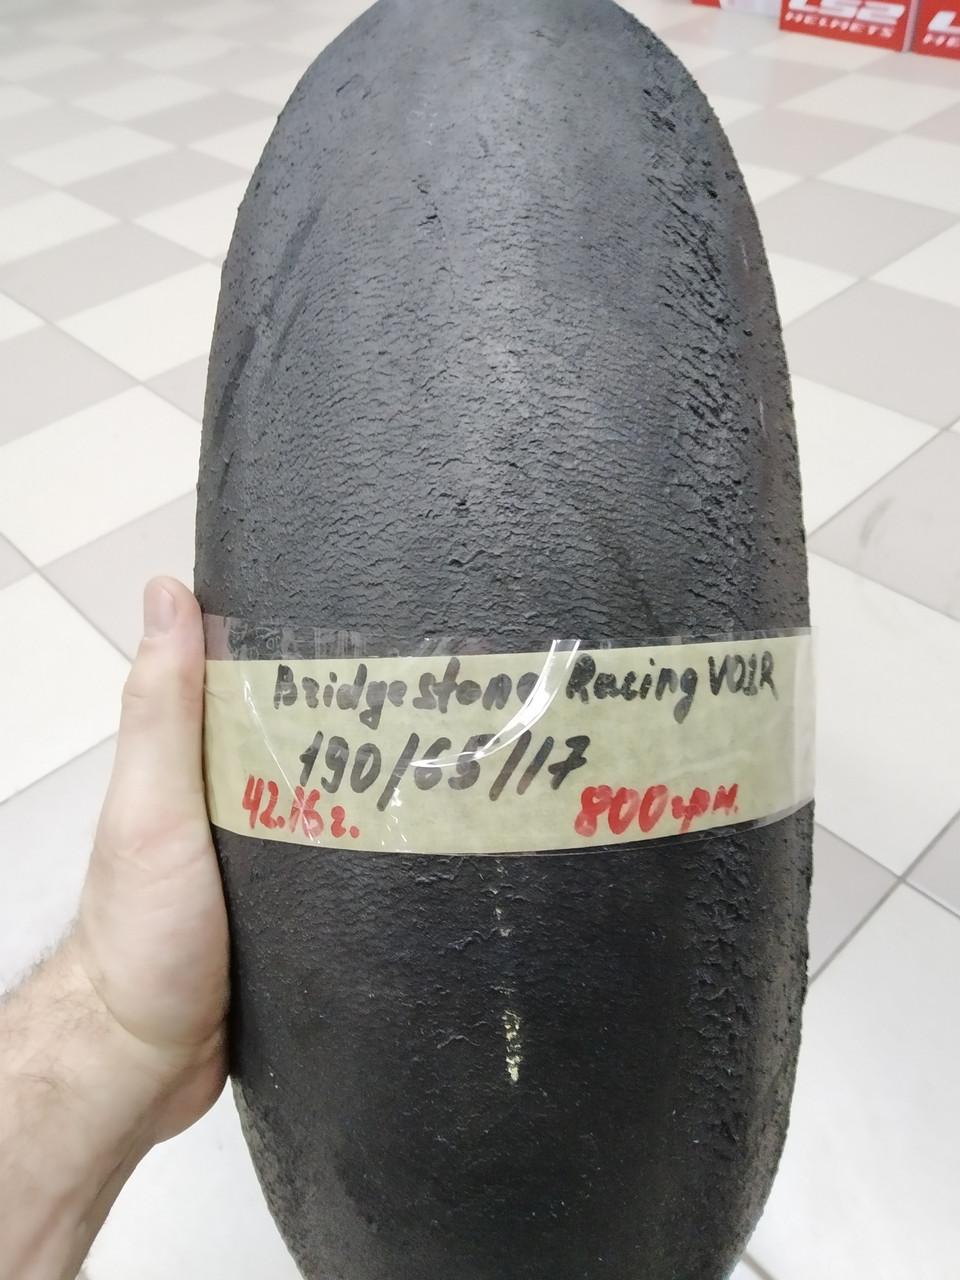 СЛІК Bridgestone Racing Battlax v01R 190 65 17 (4216) Моторезина мотошина